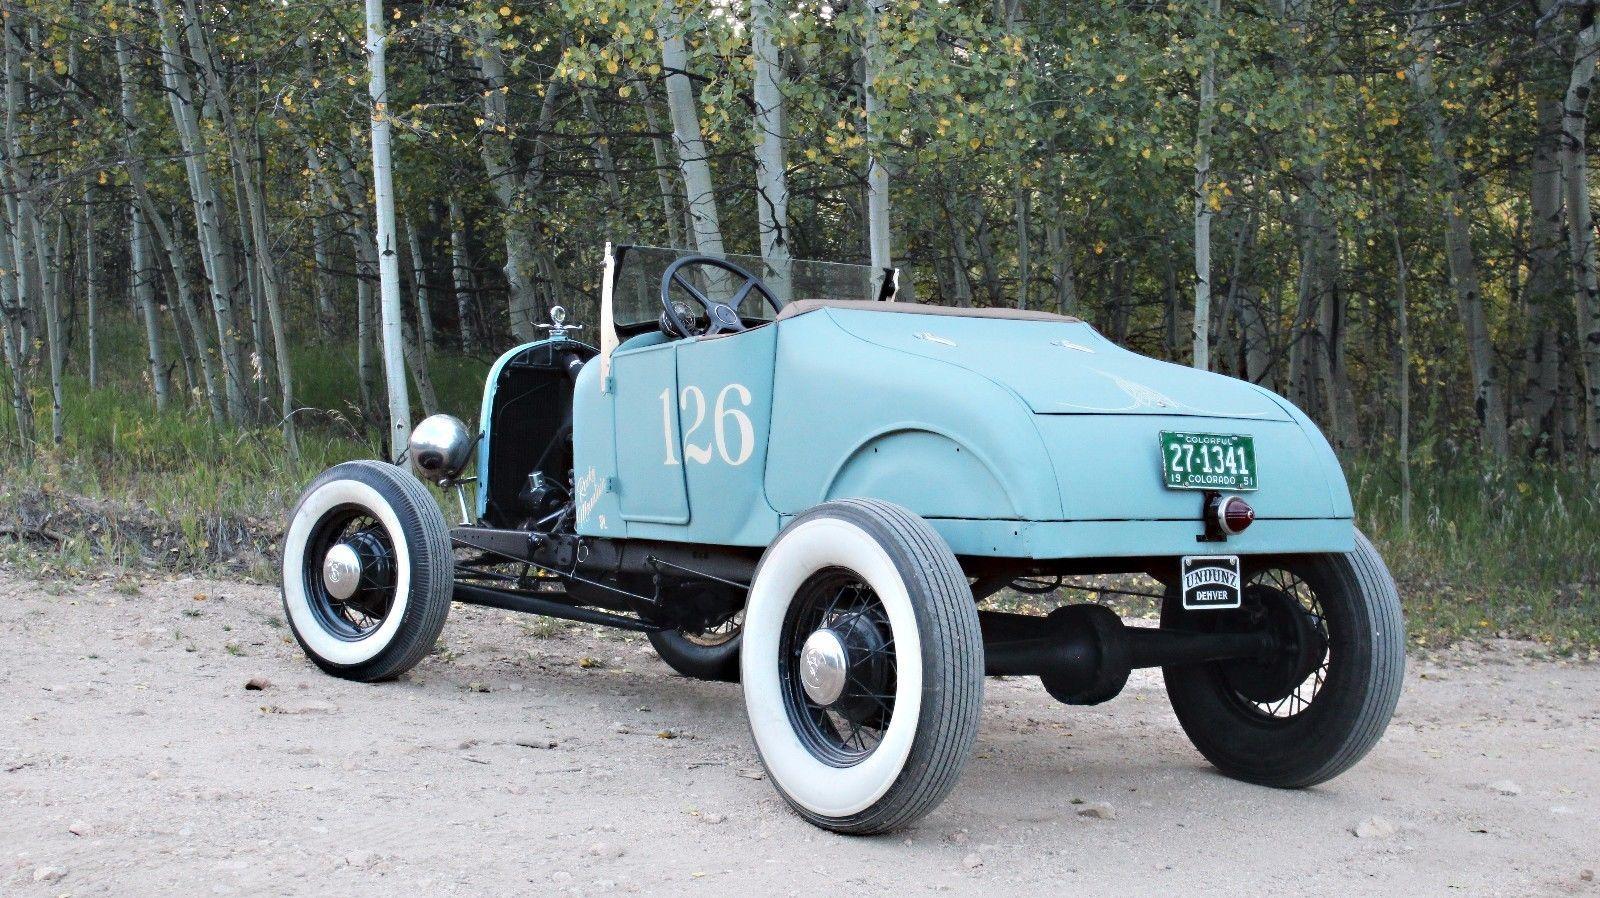 1927 Ford Model T Banger Hot Rod | Hot rods for sale | Pinterest ...